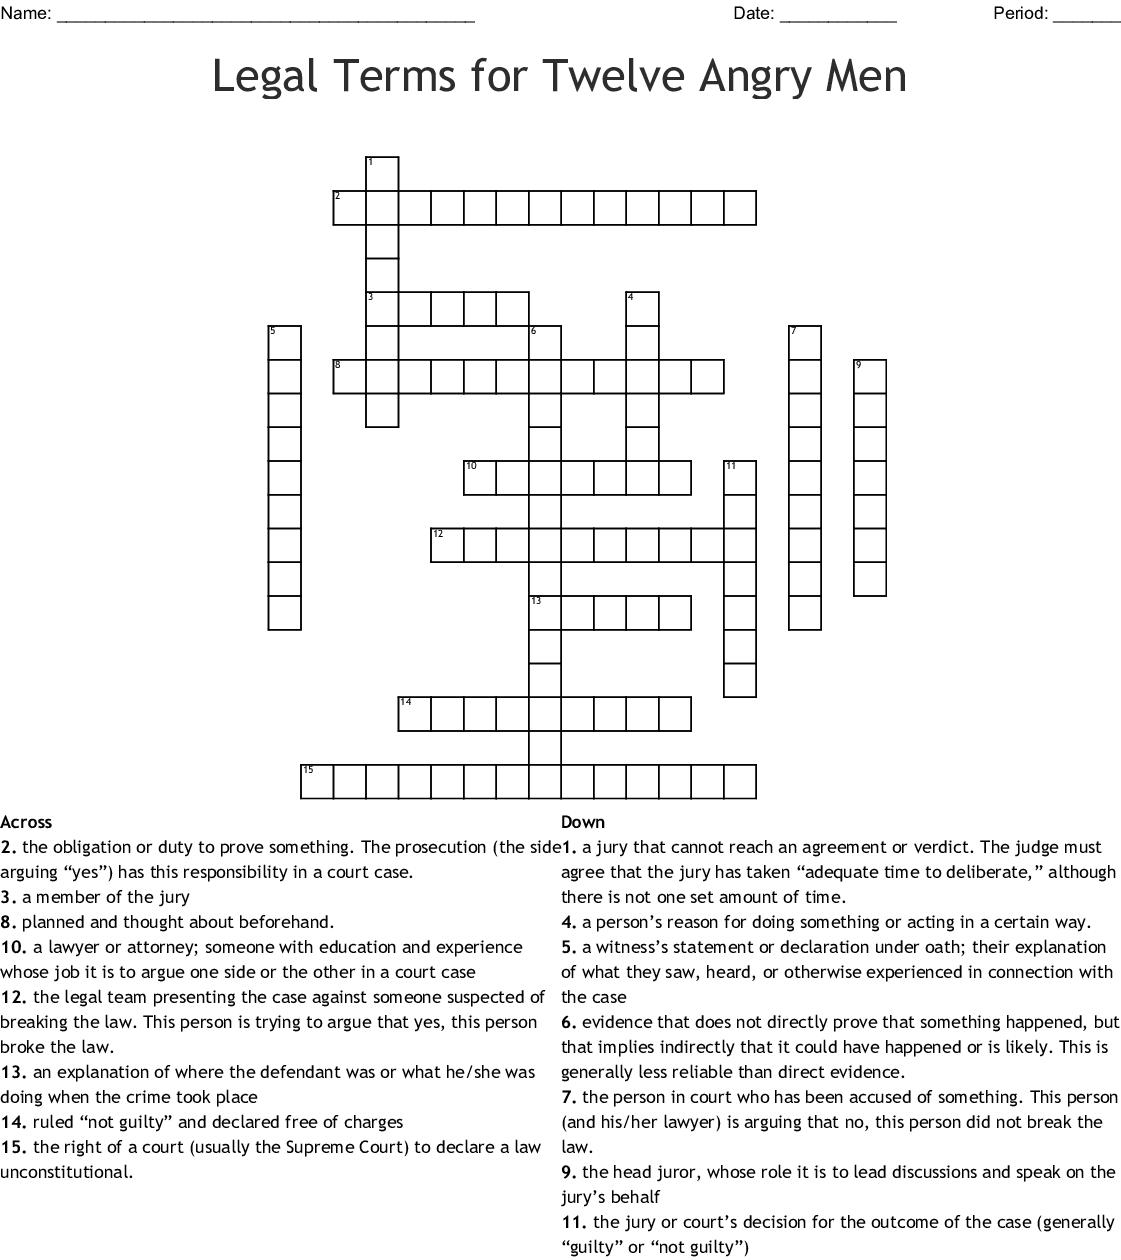 Federal Court Crossword Puzzle Wordmint